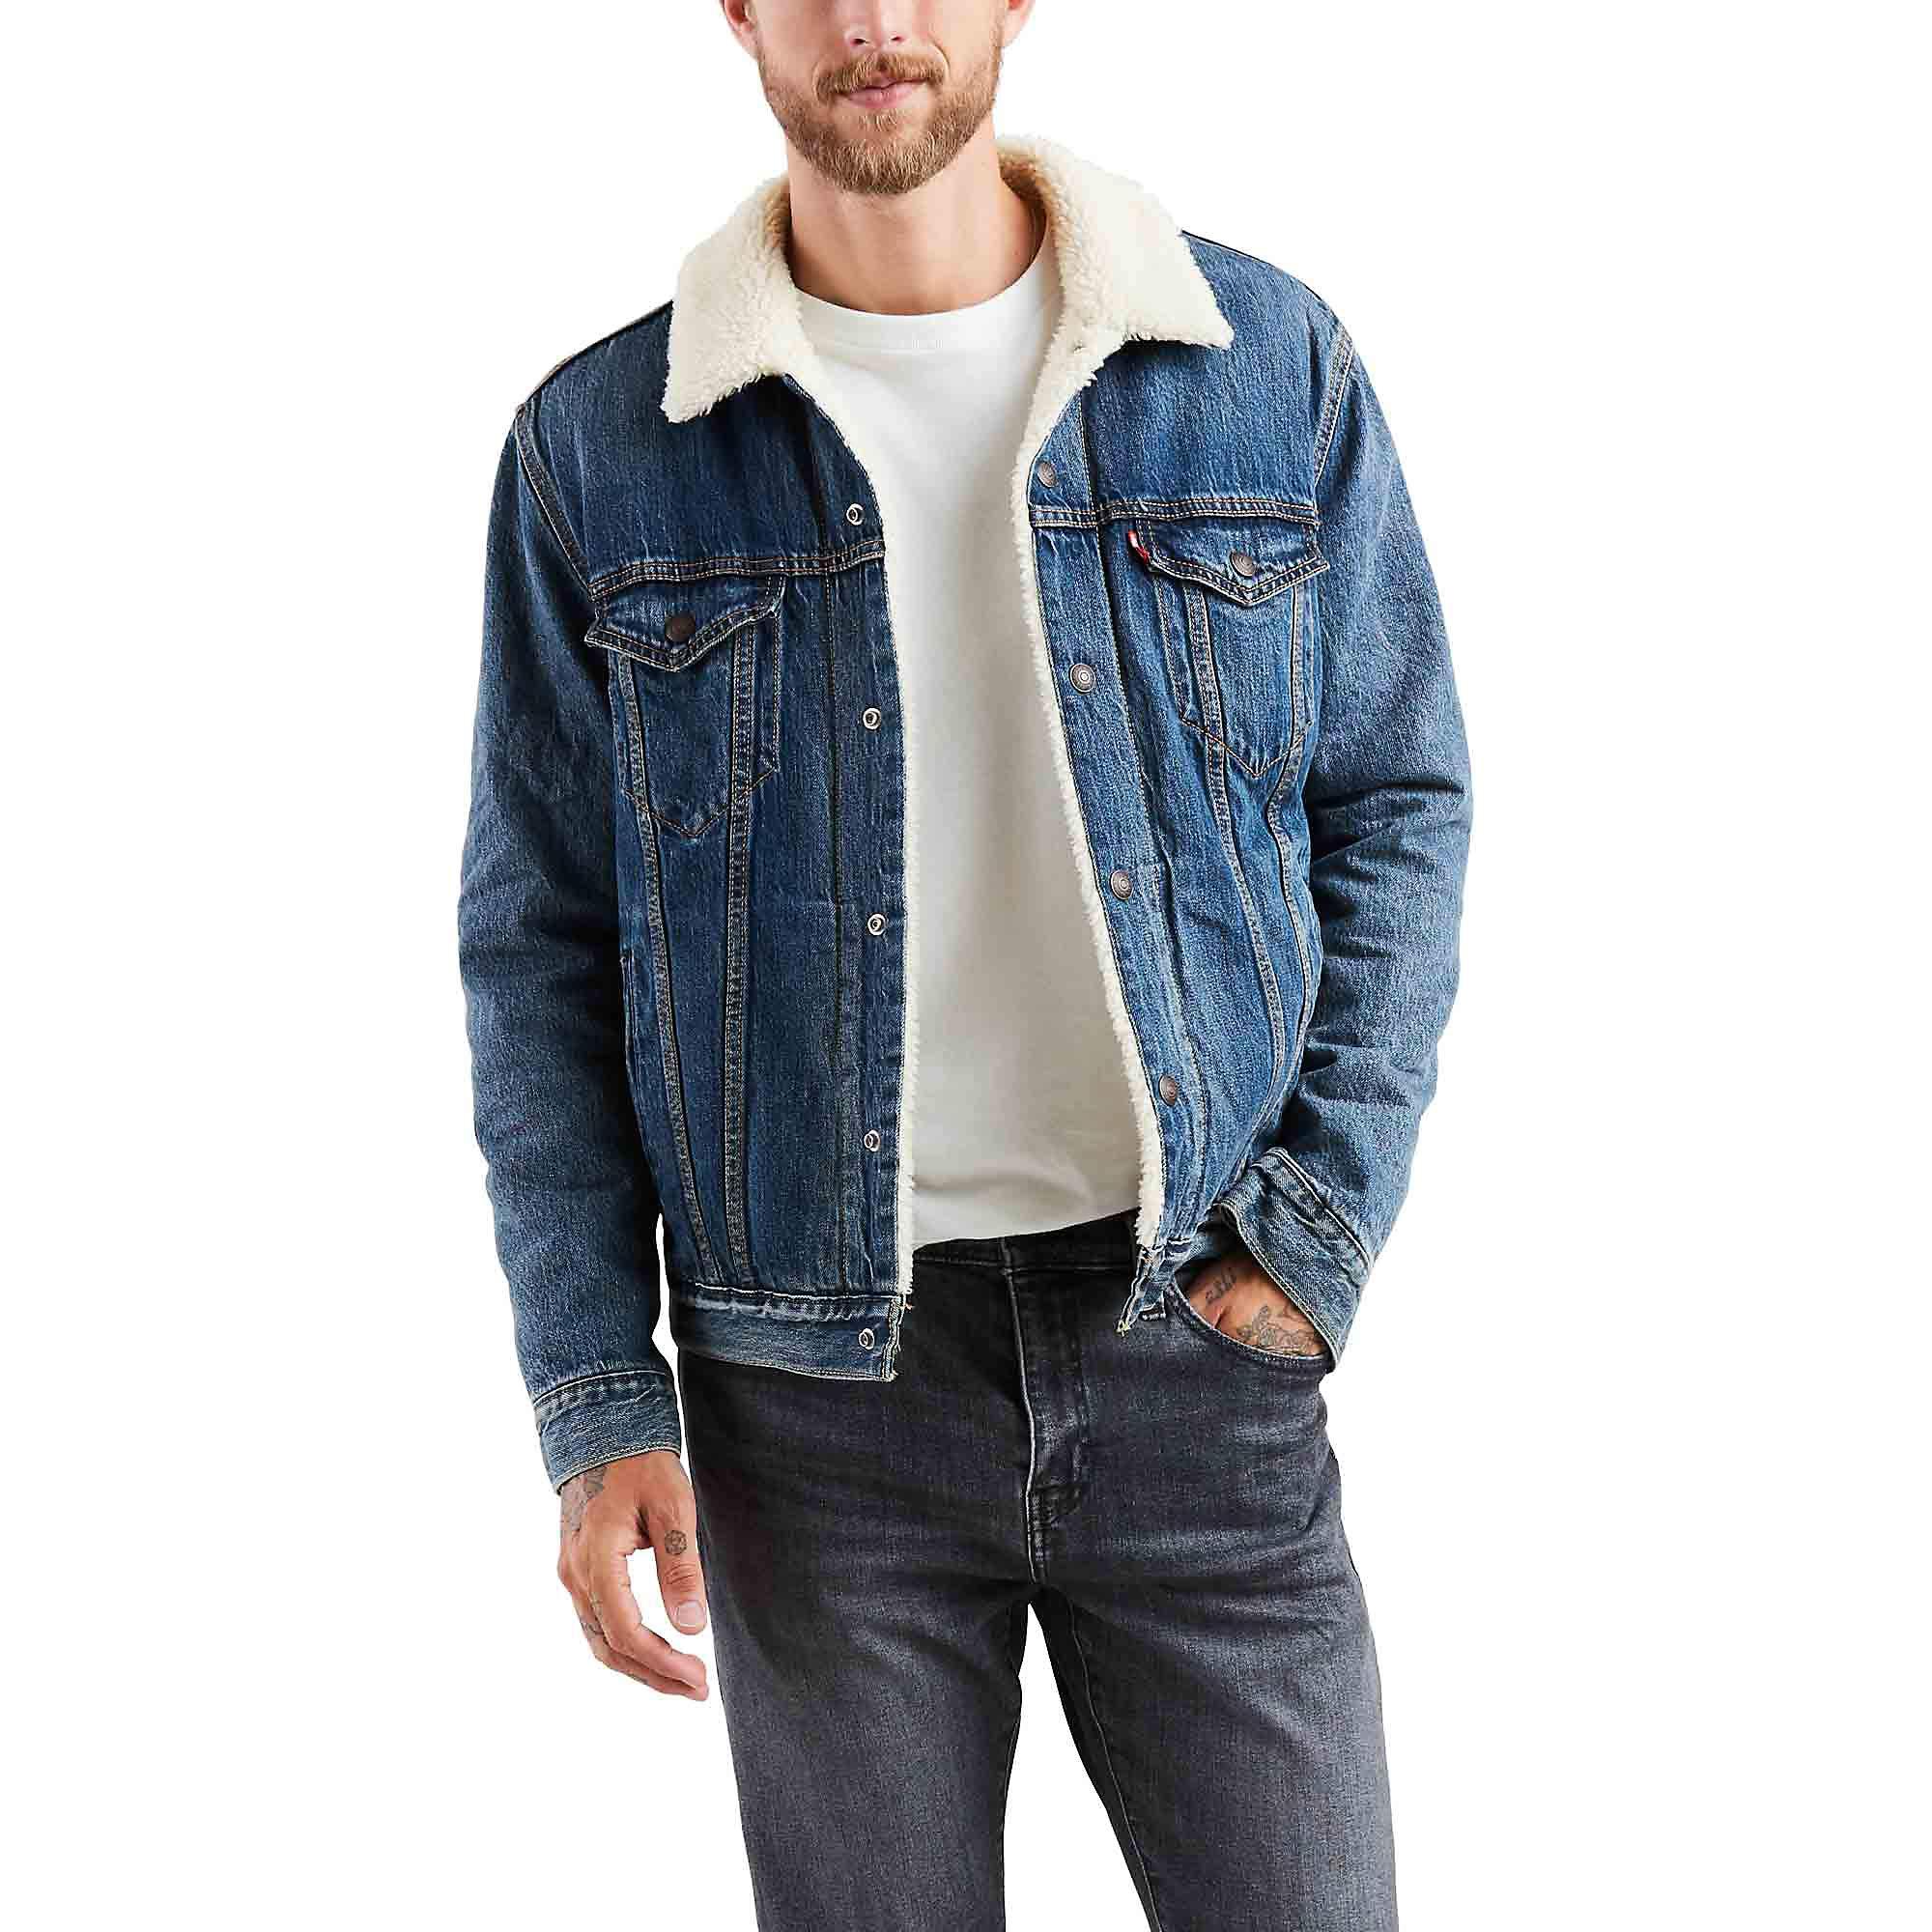 Levi's Sherpa Trucker Jacket - Men's - Mays L by Levi's